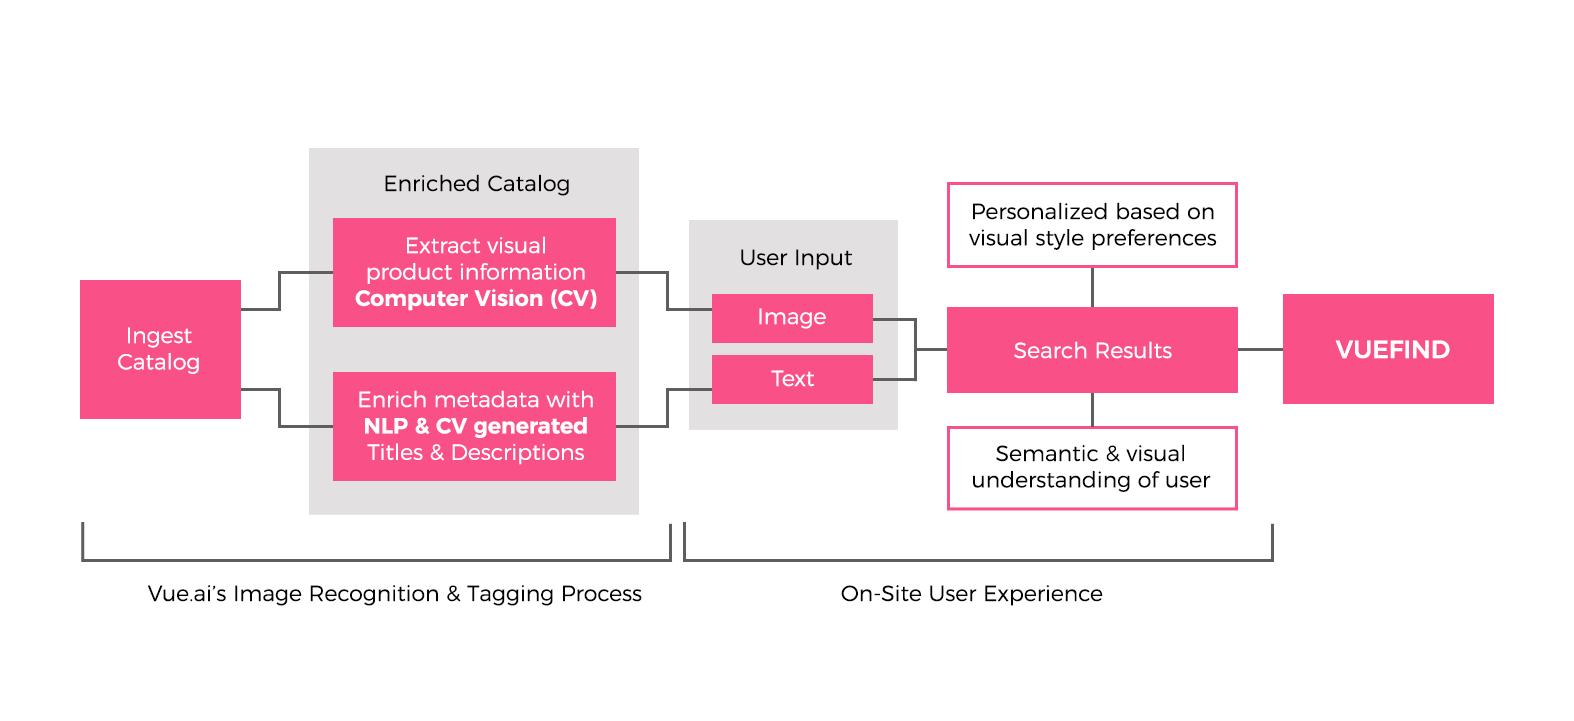 process-diagram-vuefind